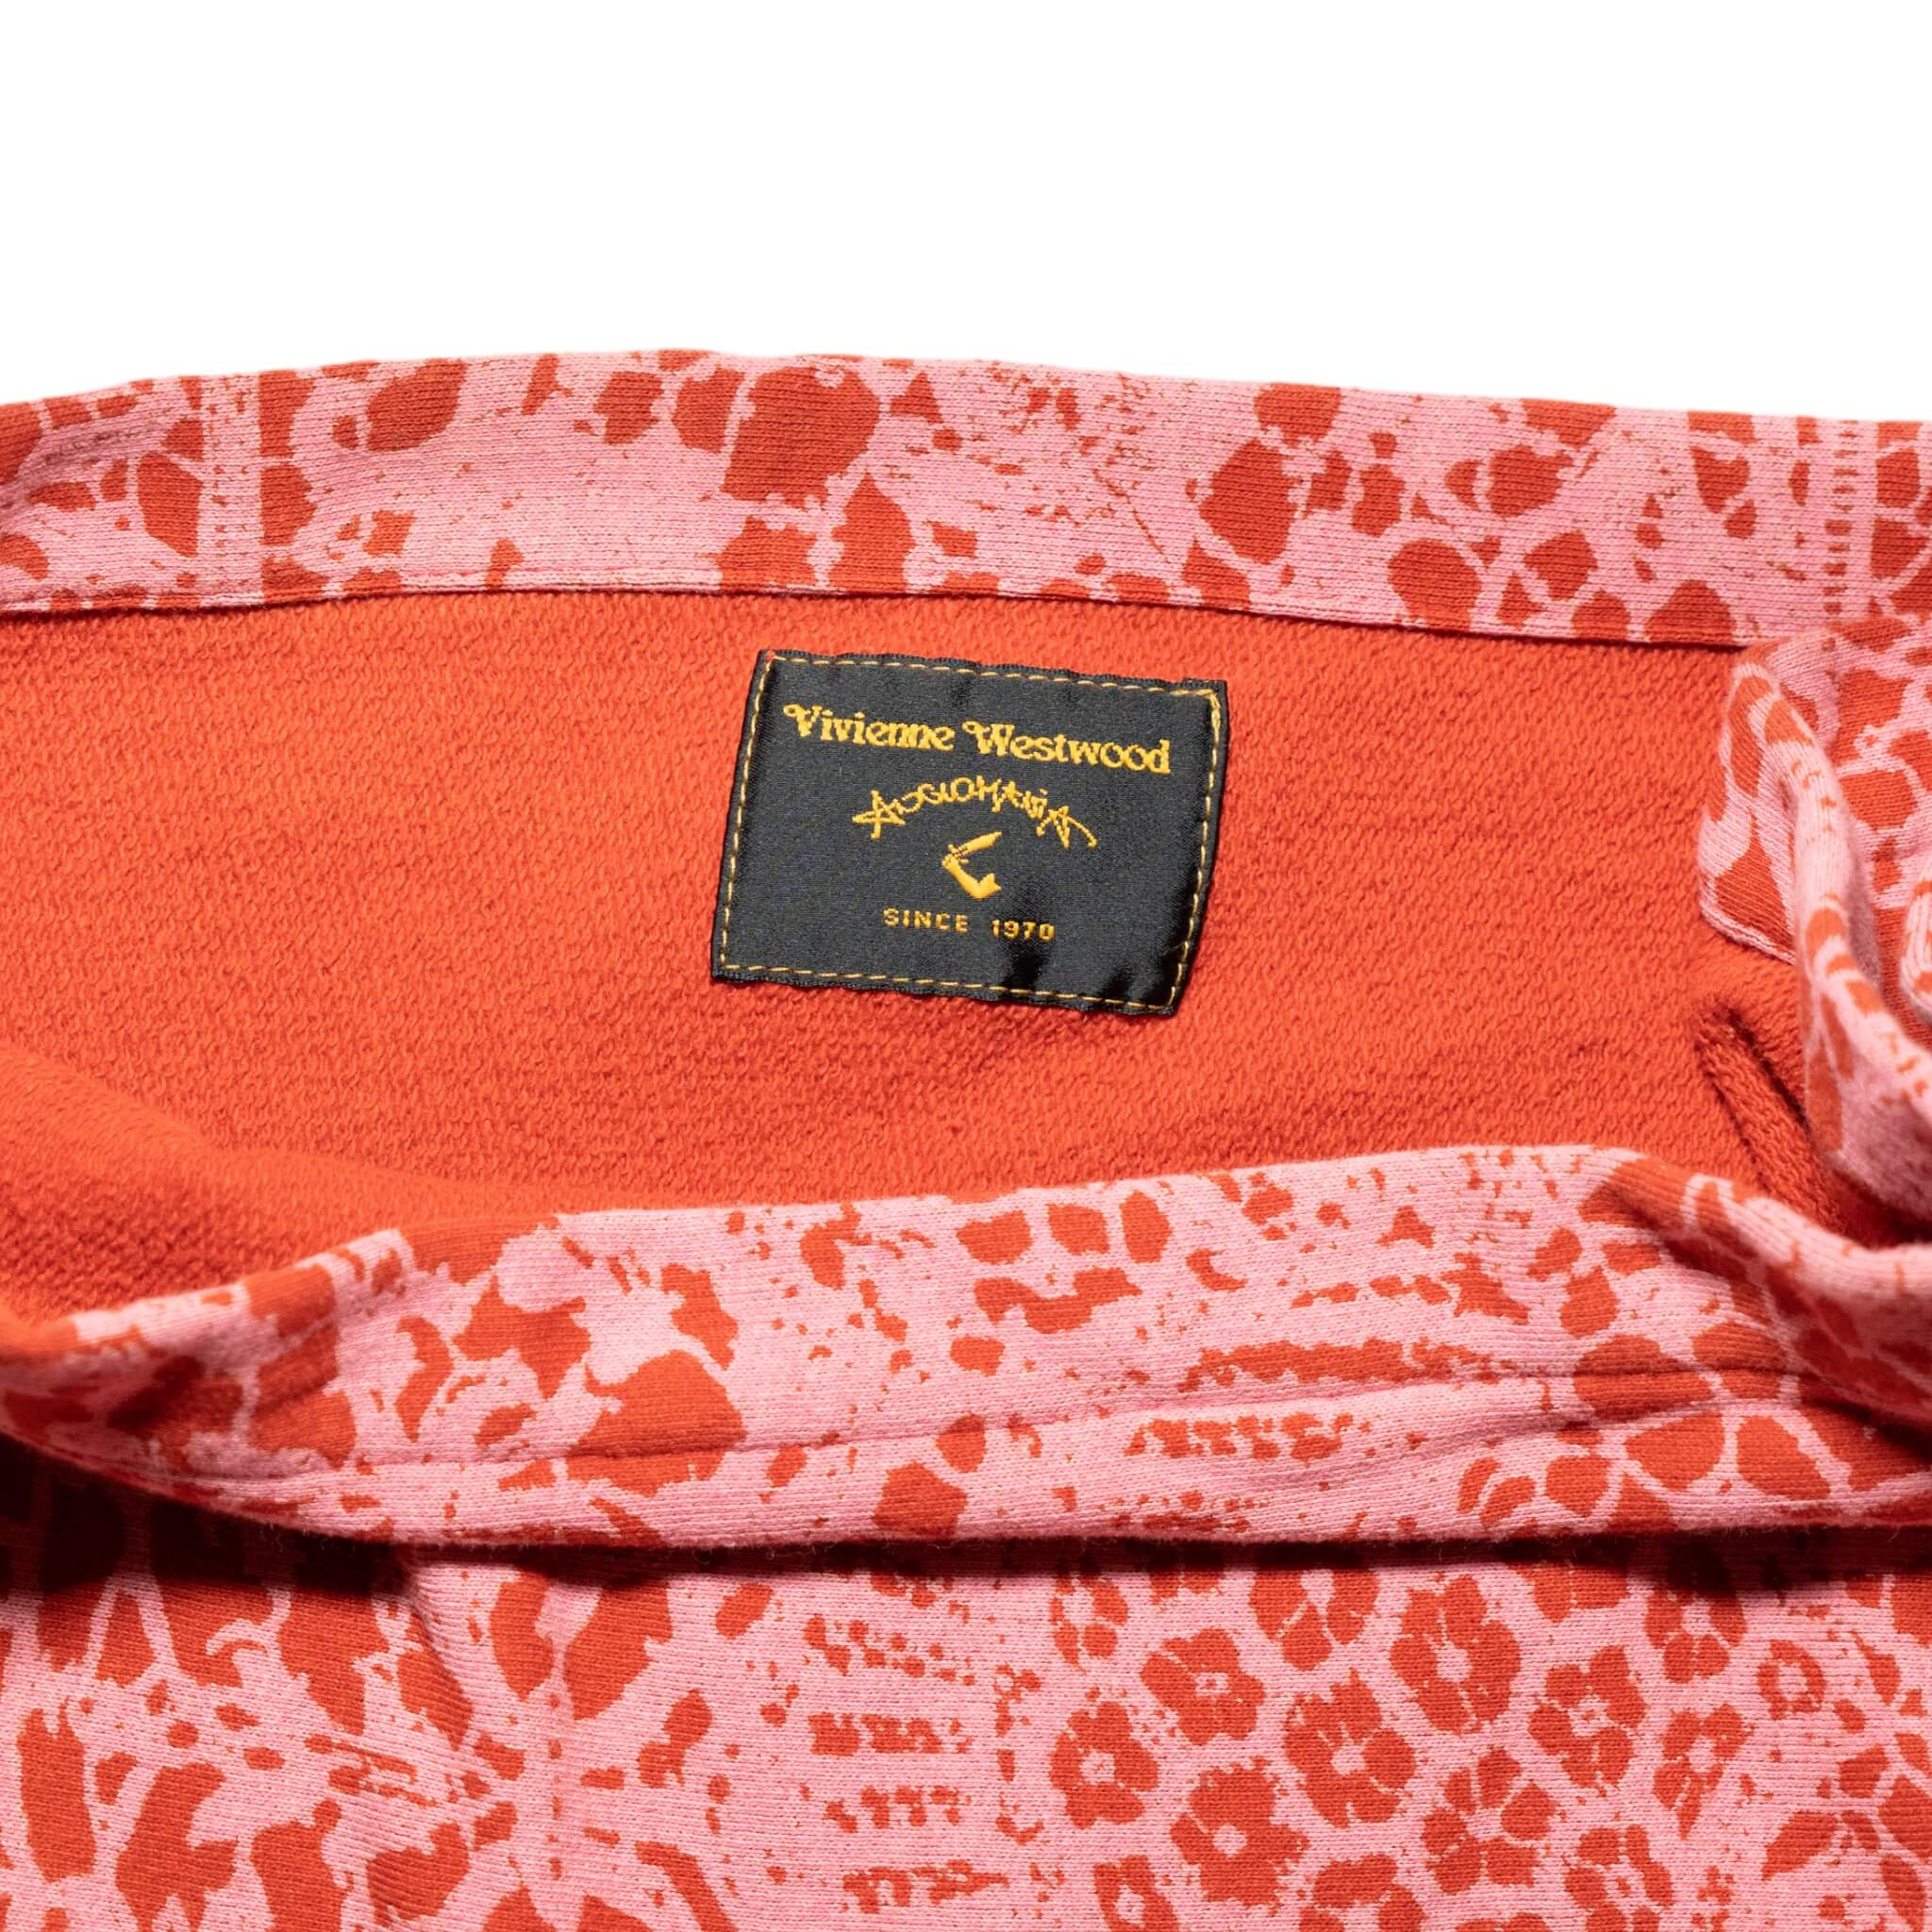 Vivienne Westwood Boho Moment Paisley Skirt